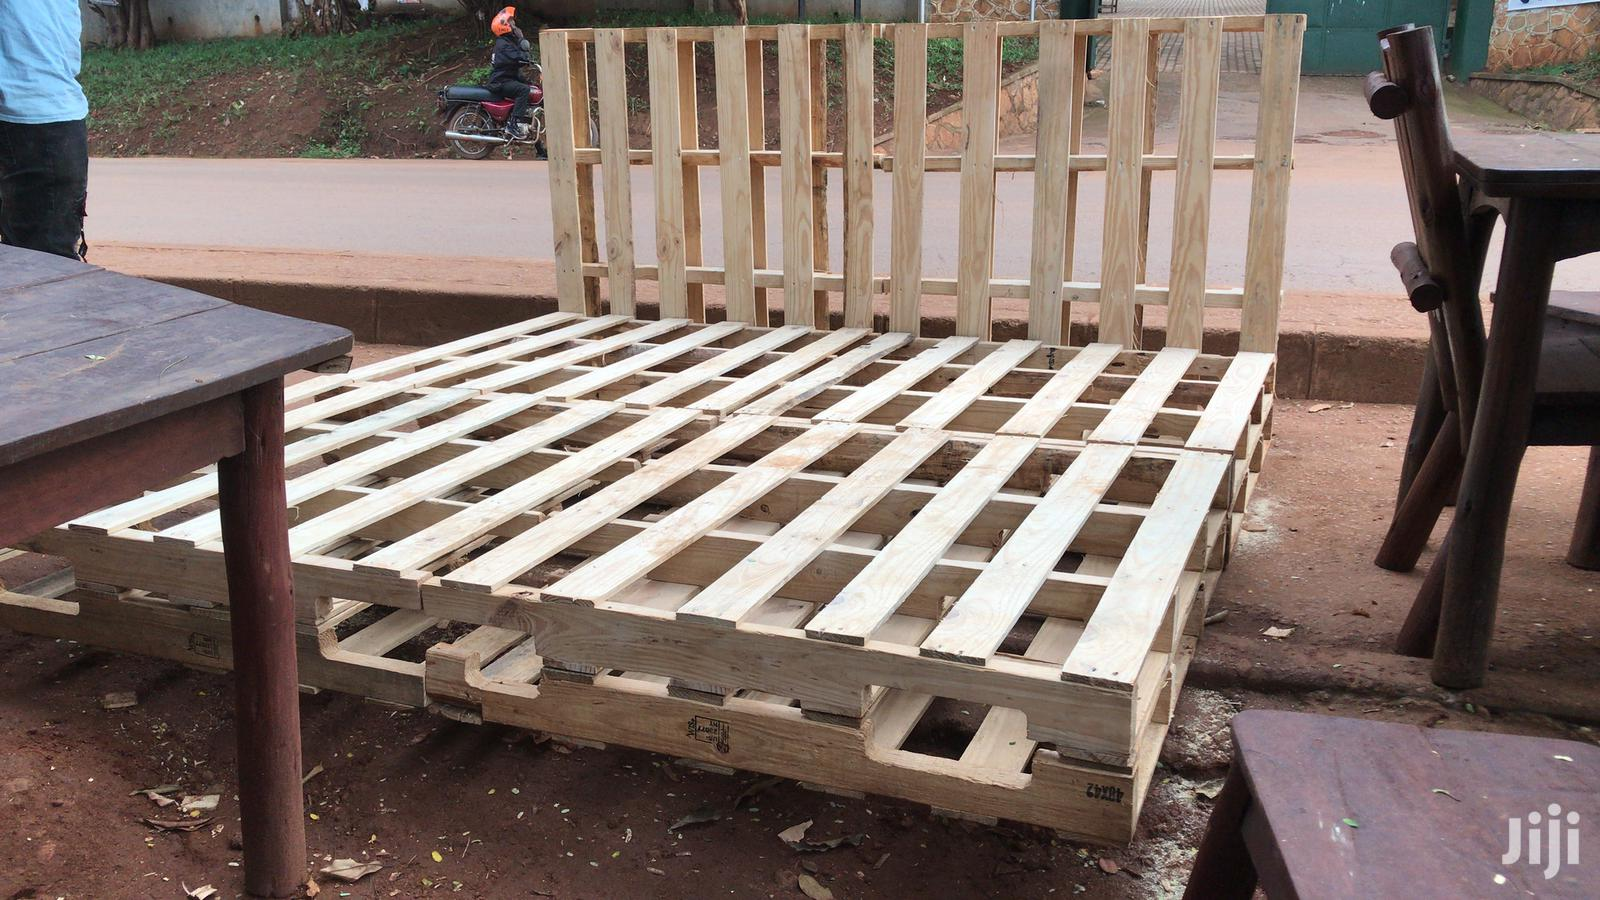 Pallet Bed King Size In Kampala Furniture Arafat Furniture Workshop Jiji Ug